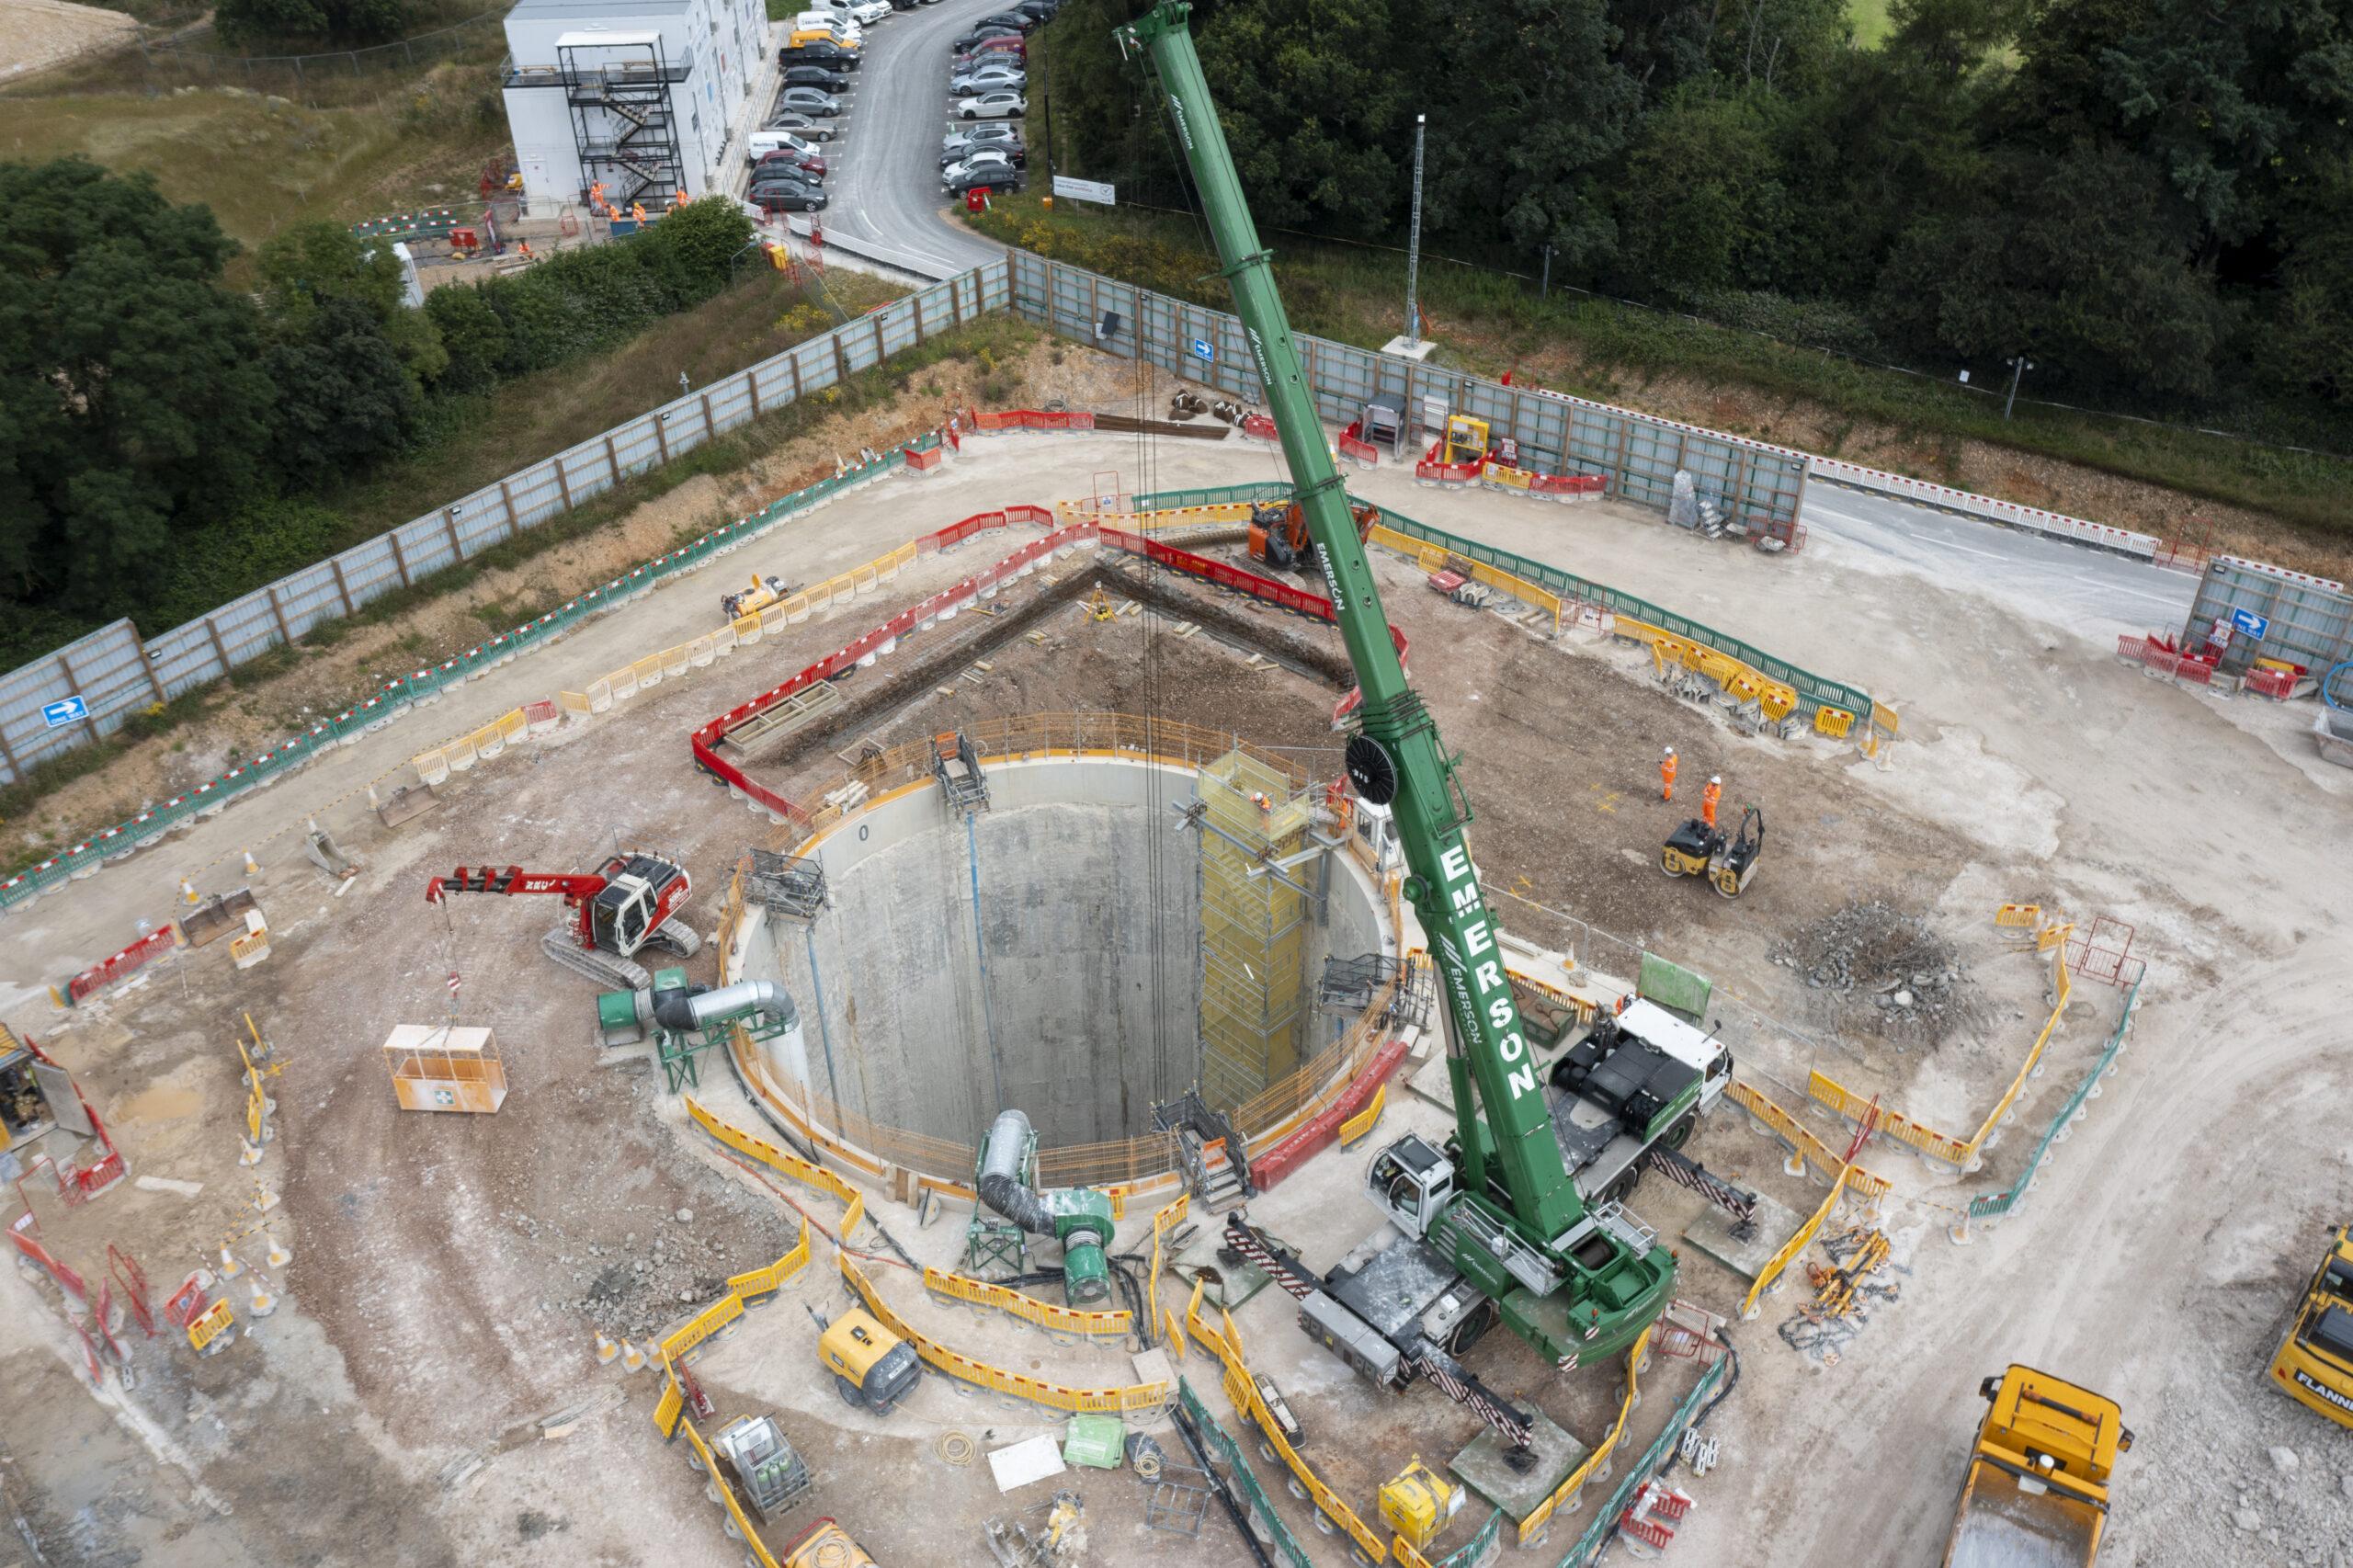 Excavation begins on Chalfont St Peter vent shaft in Buckinghamshire